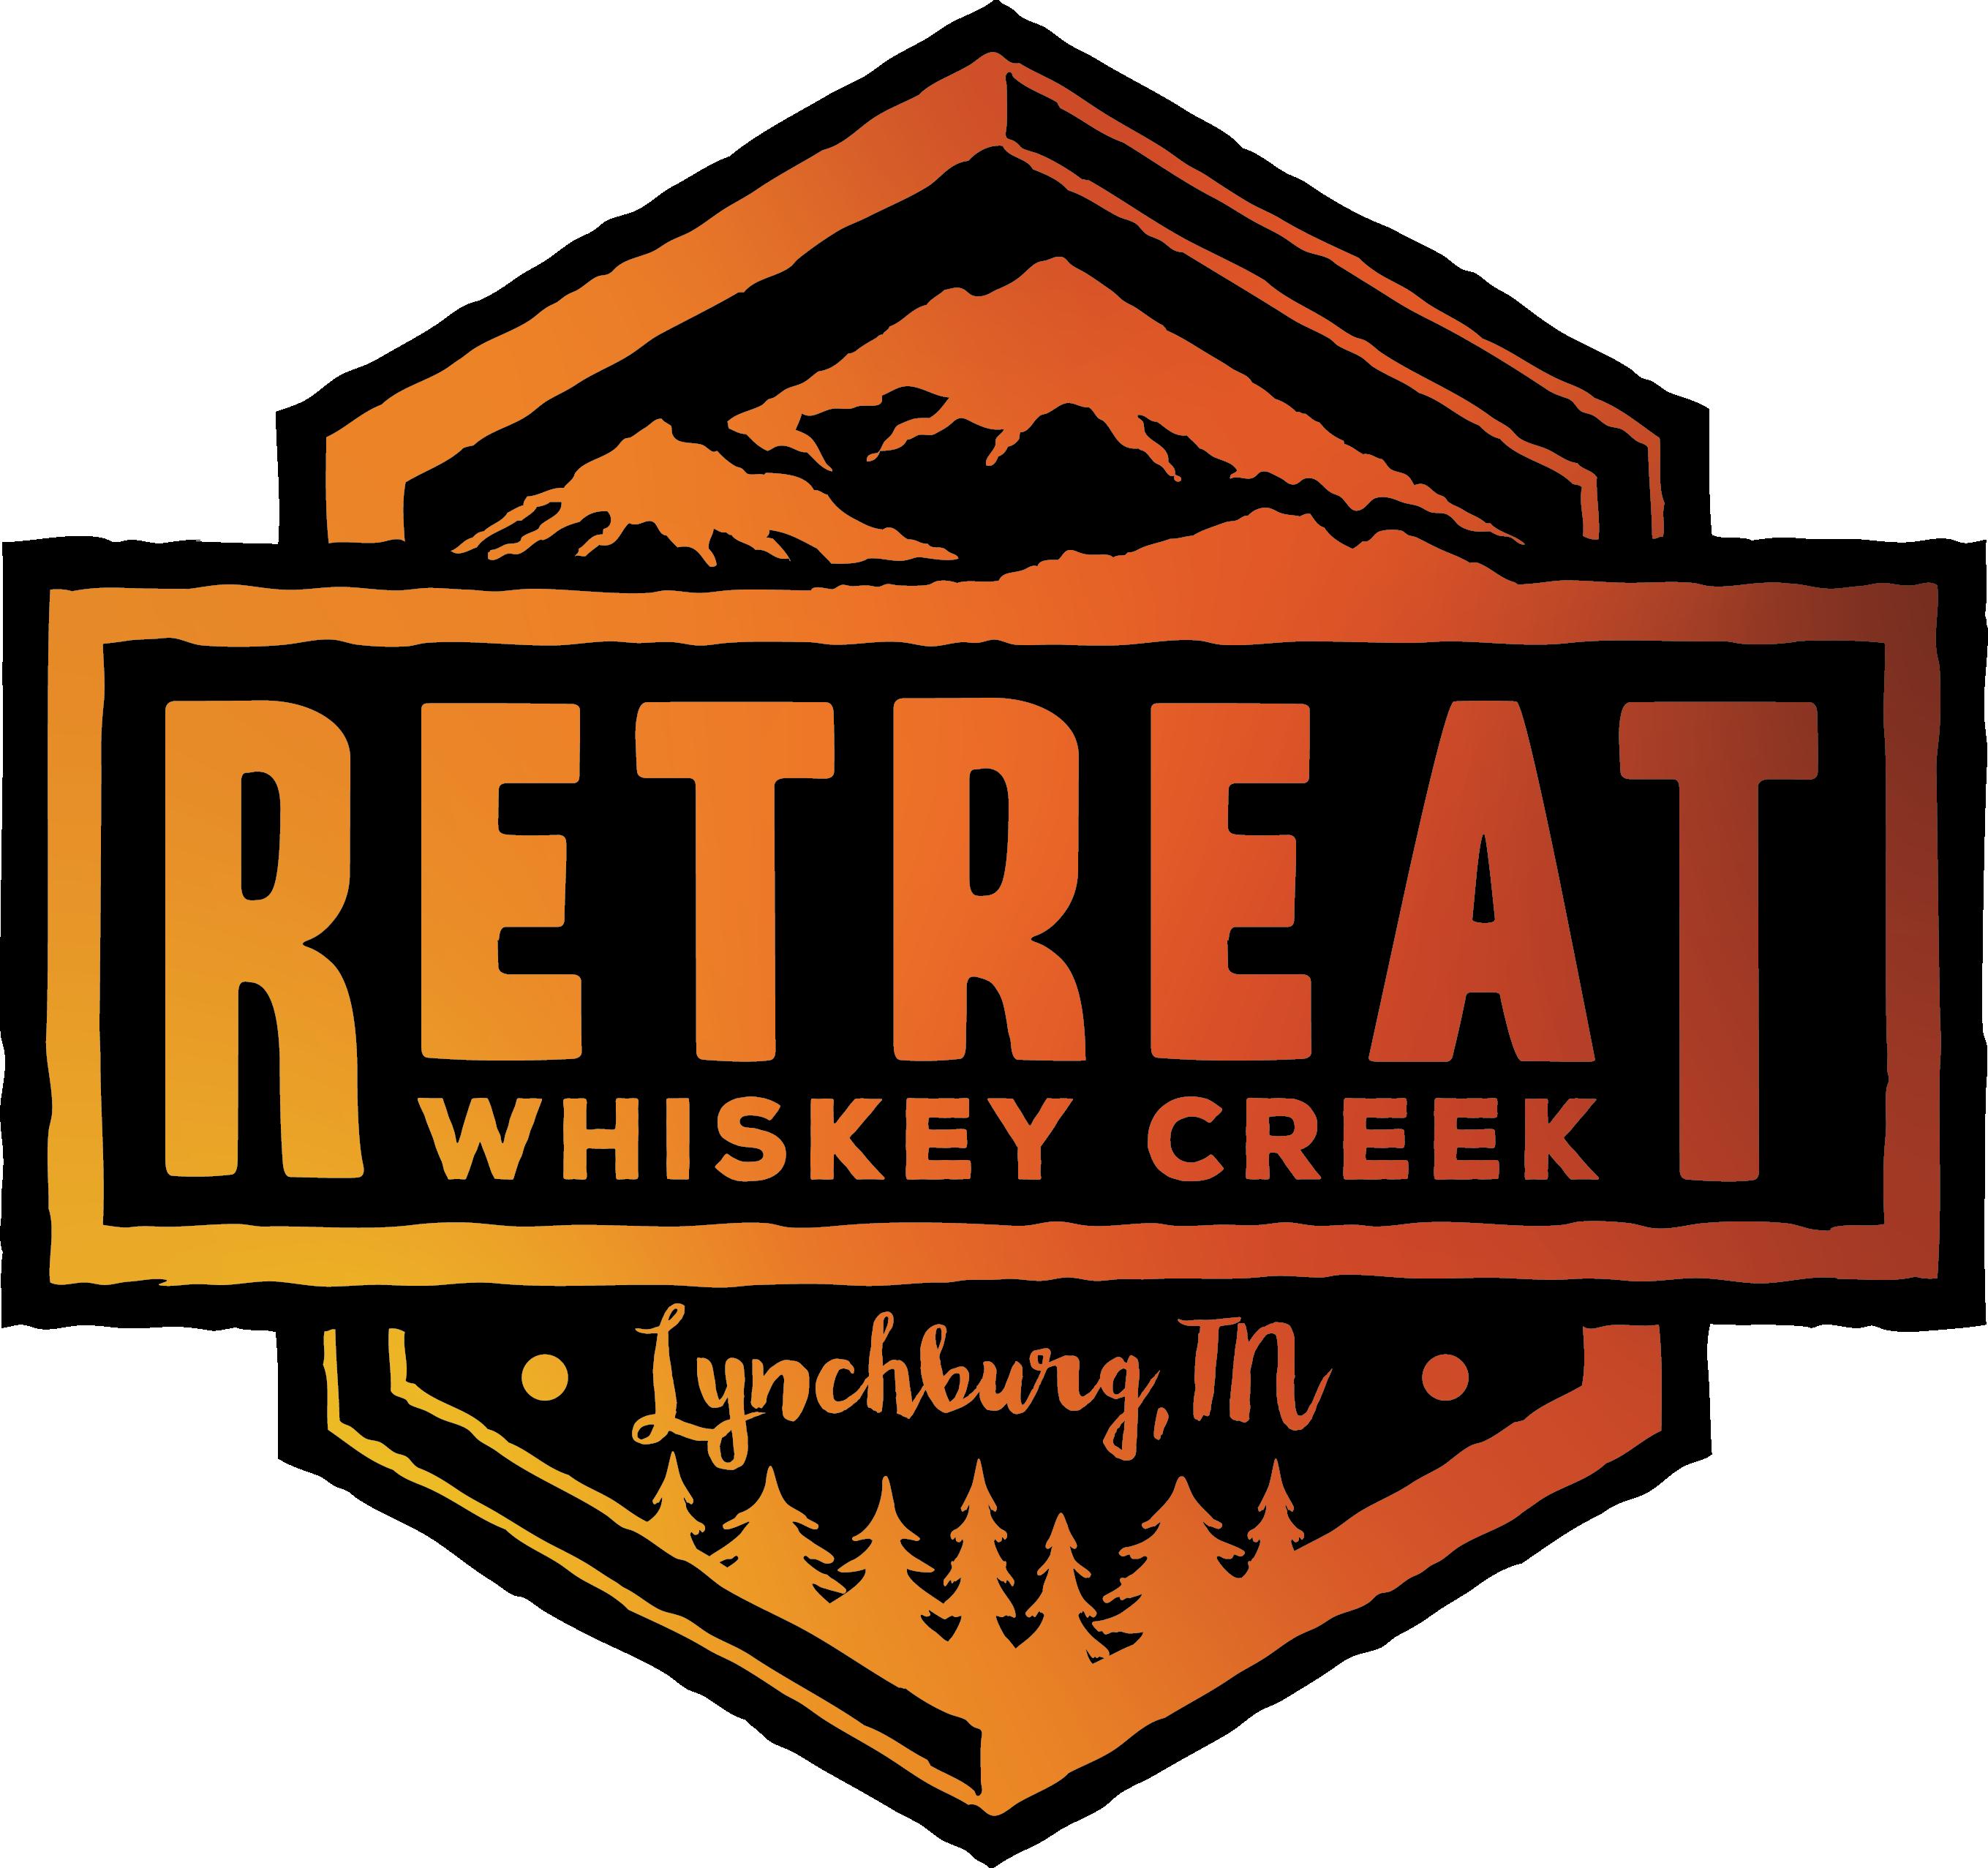 Whiskey Creek